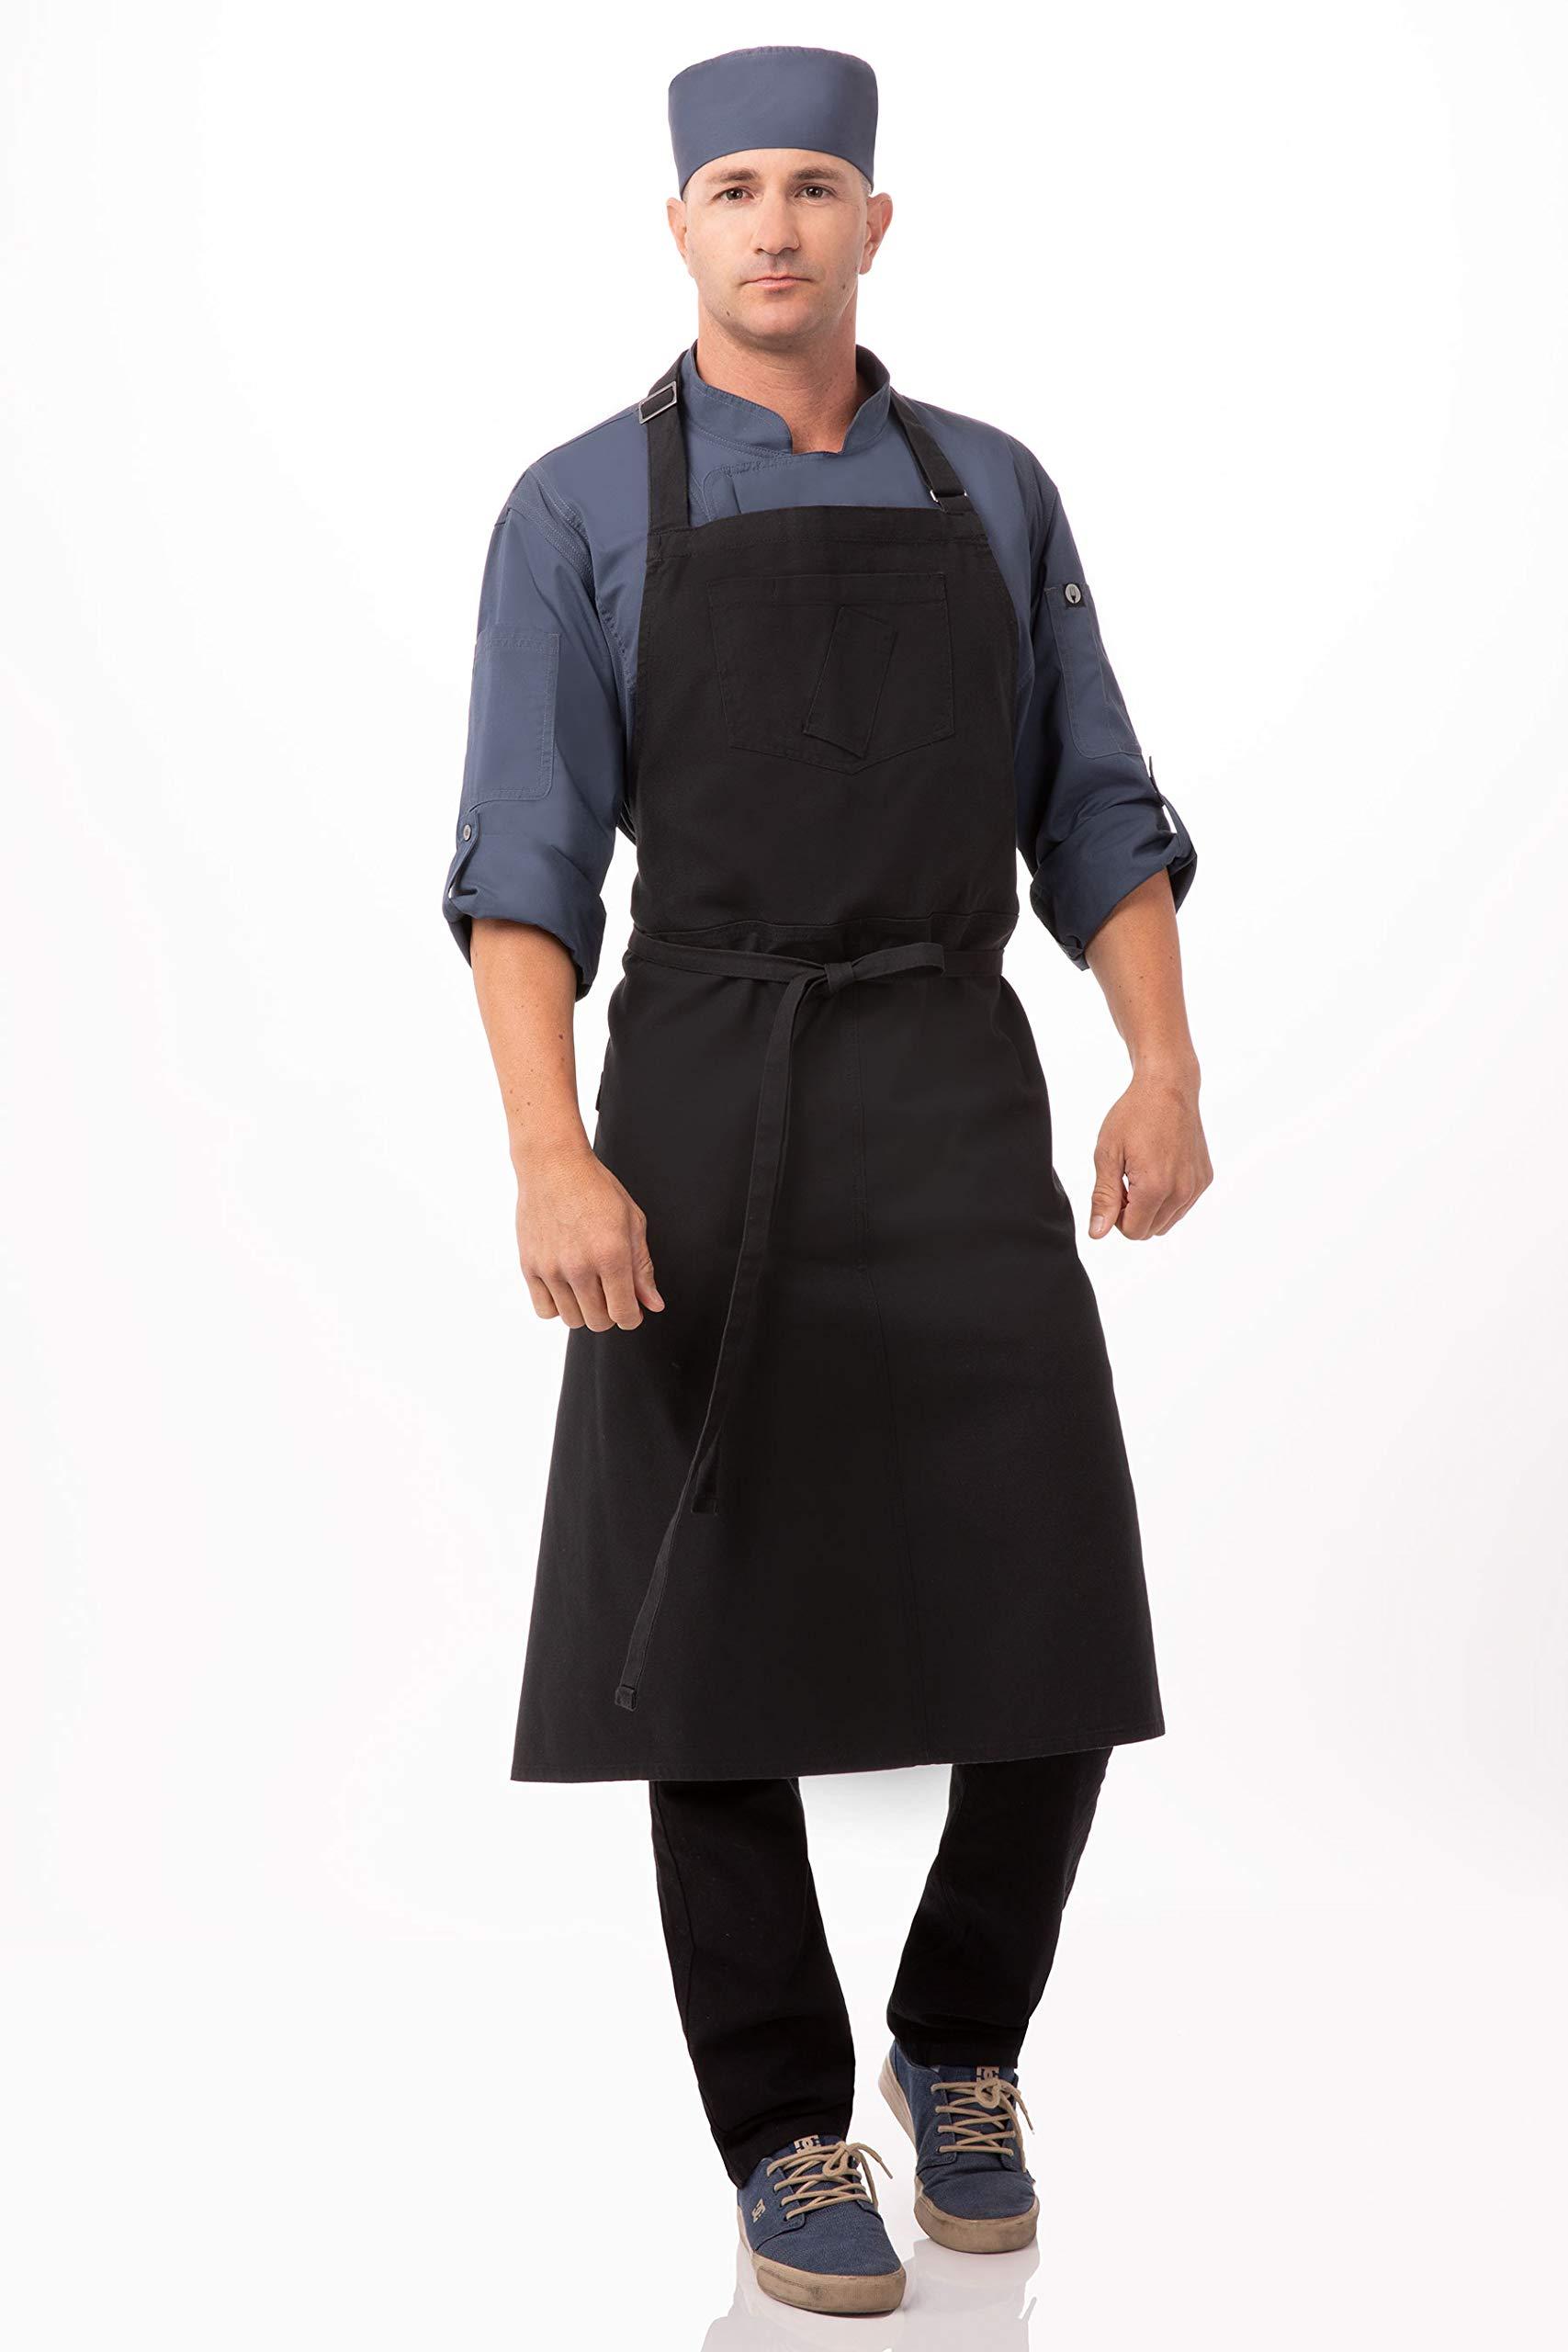 Chef Works Unisex Rockford Chefs Bib Apron, Steel Gray, 0 by Chef Works